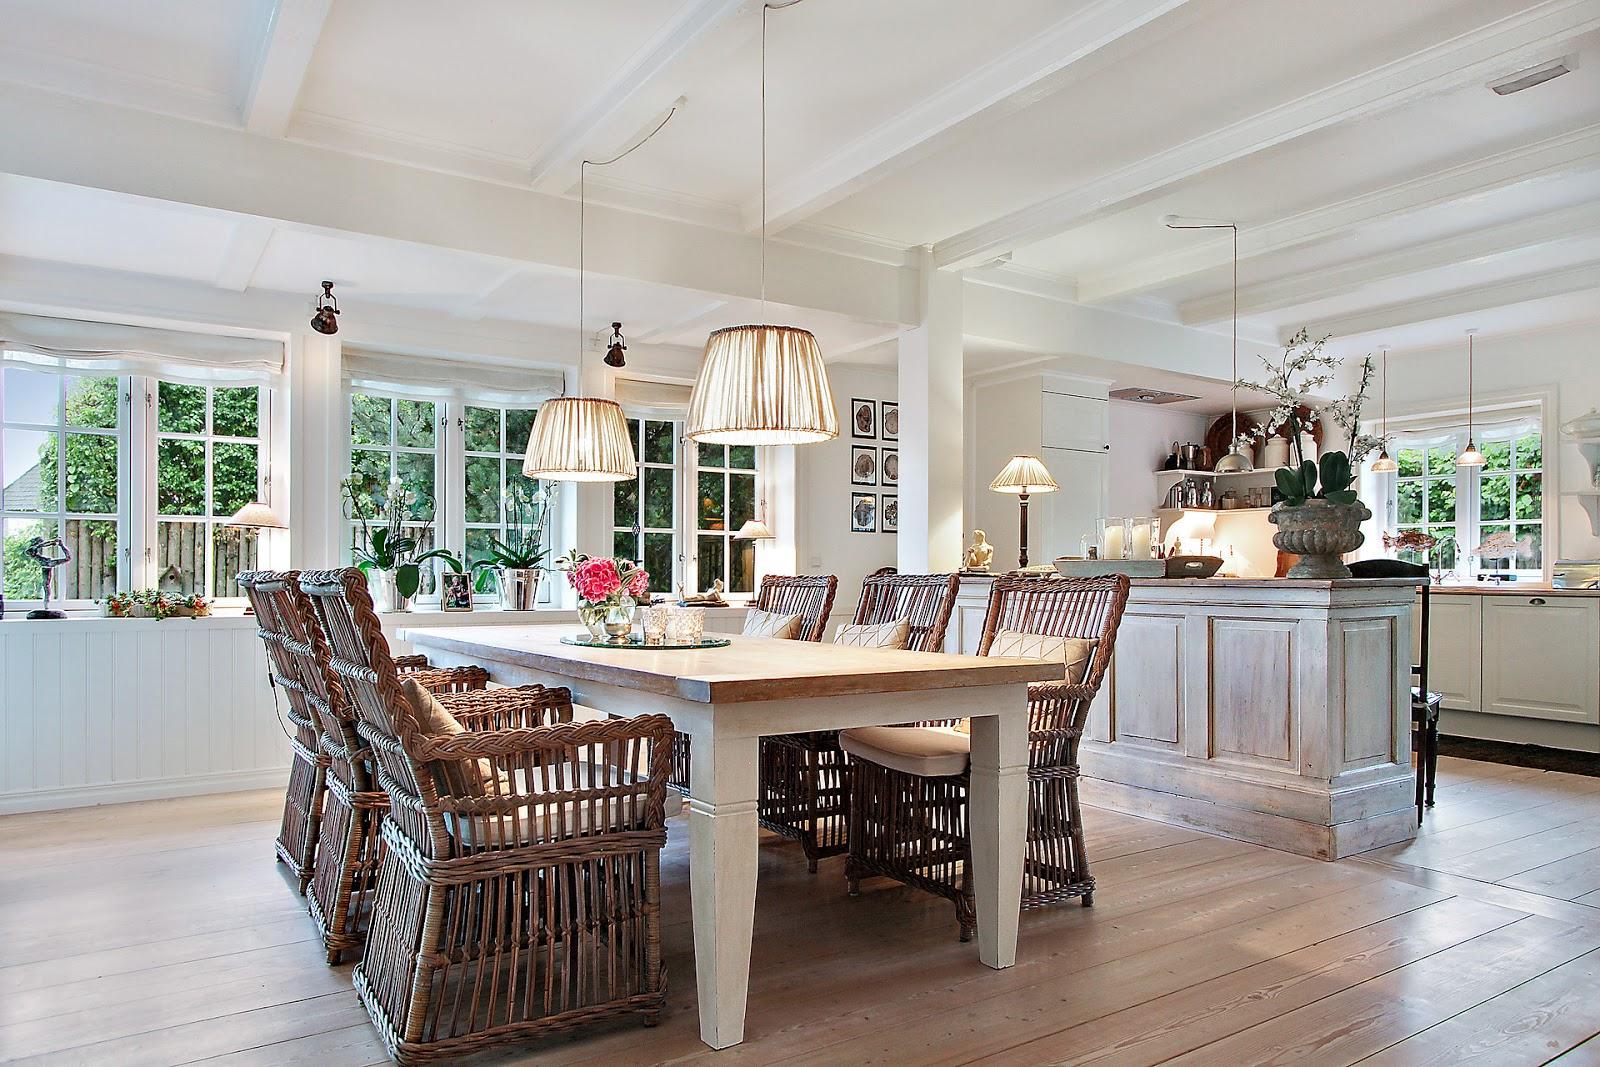 Lovely deco une jolie maison au style campagnard - Salon ambiance cosy ...